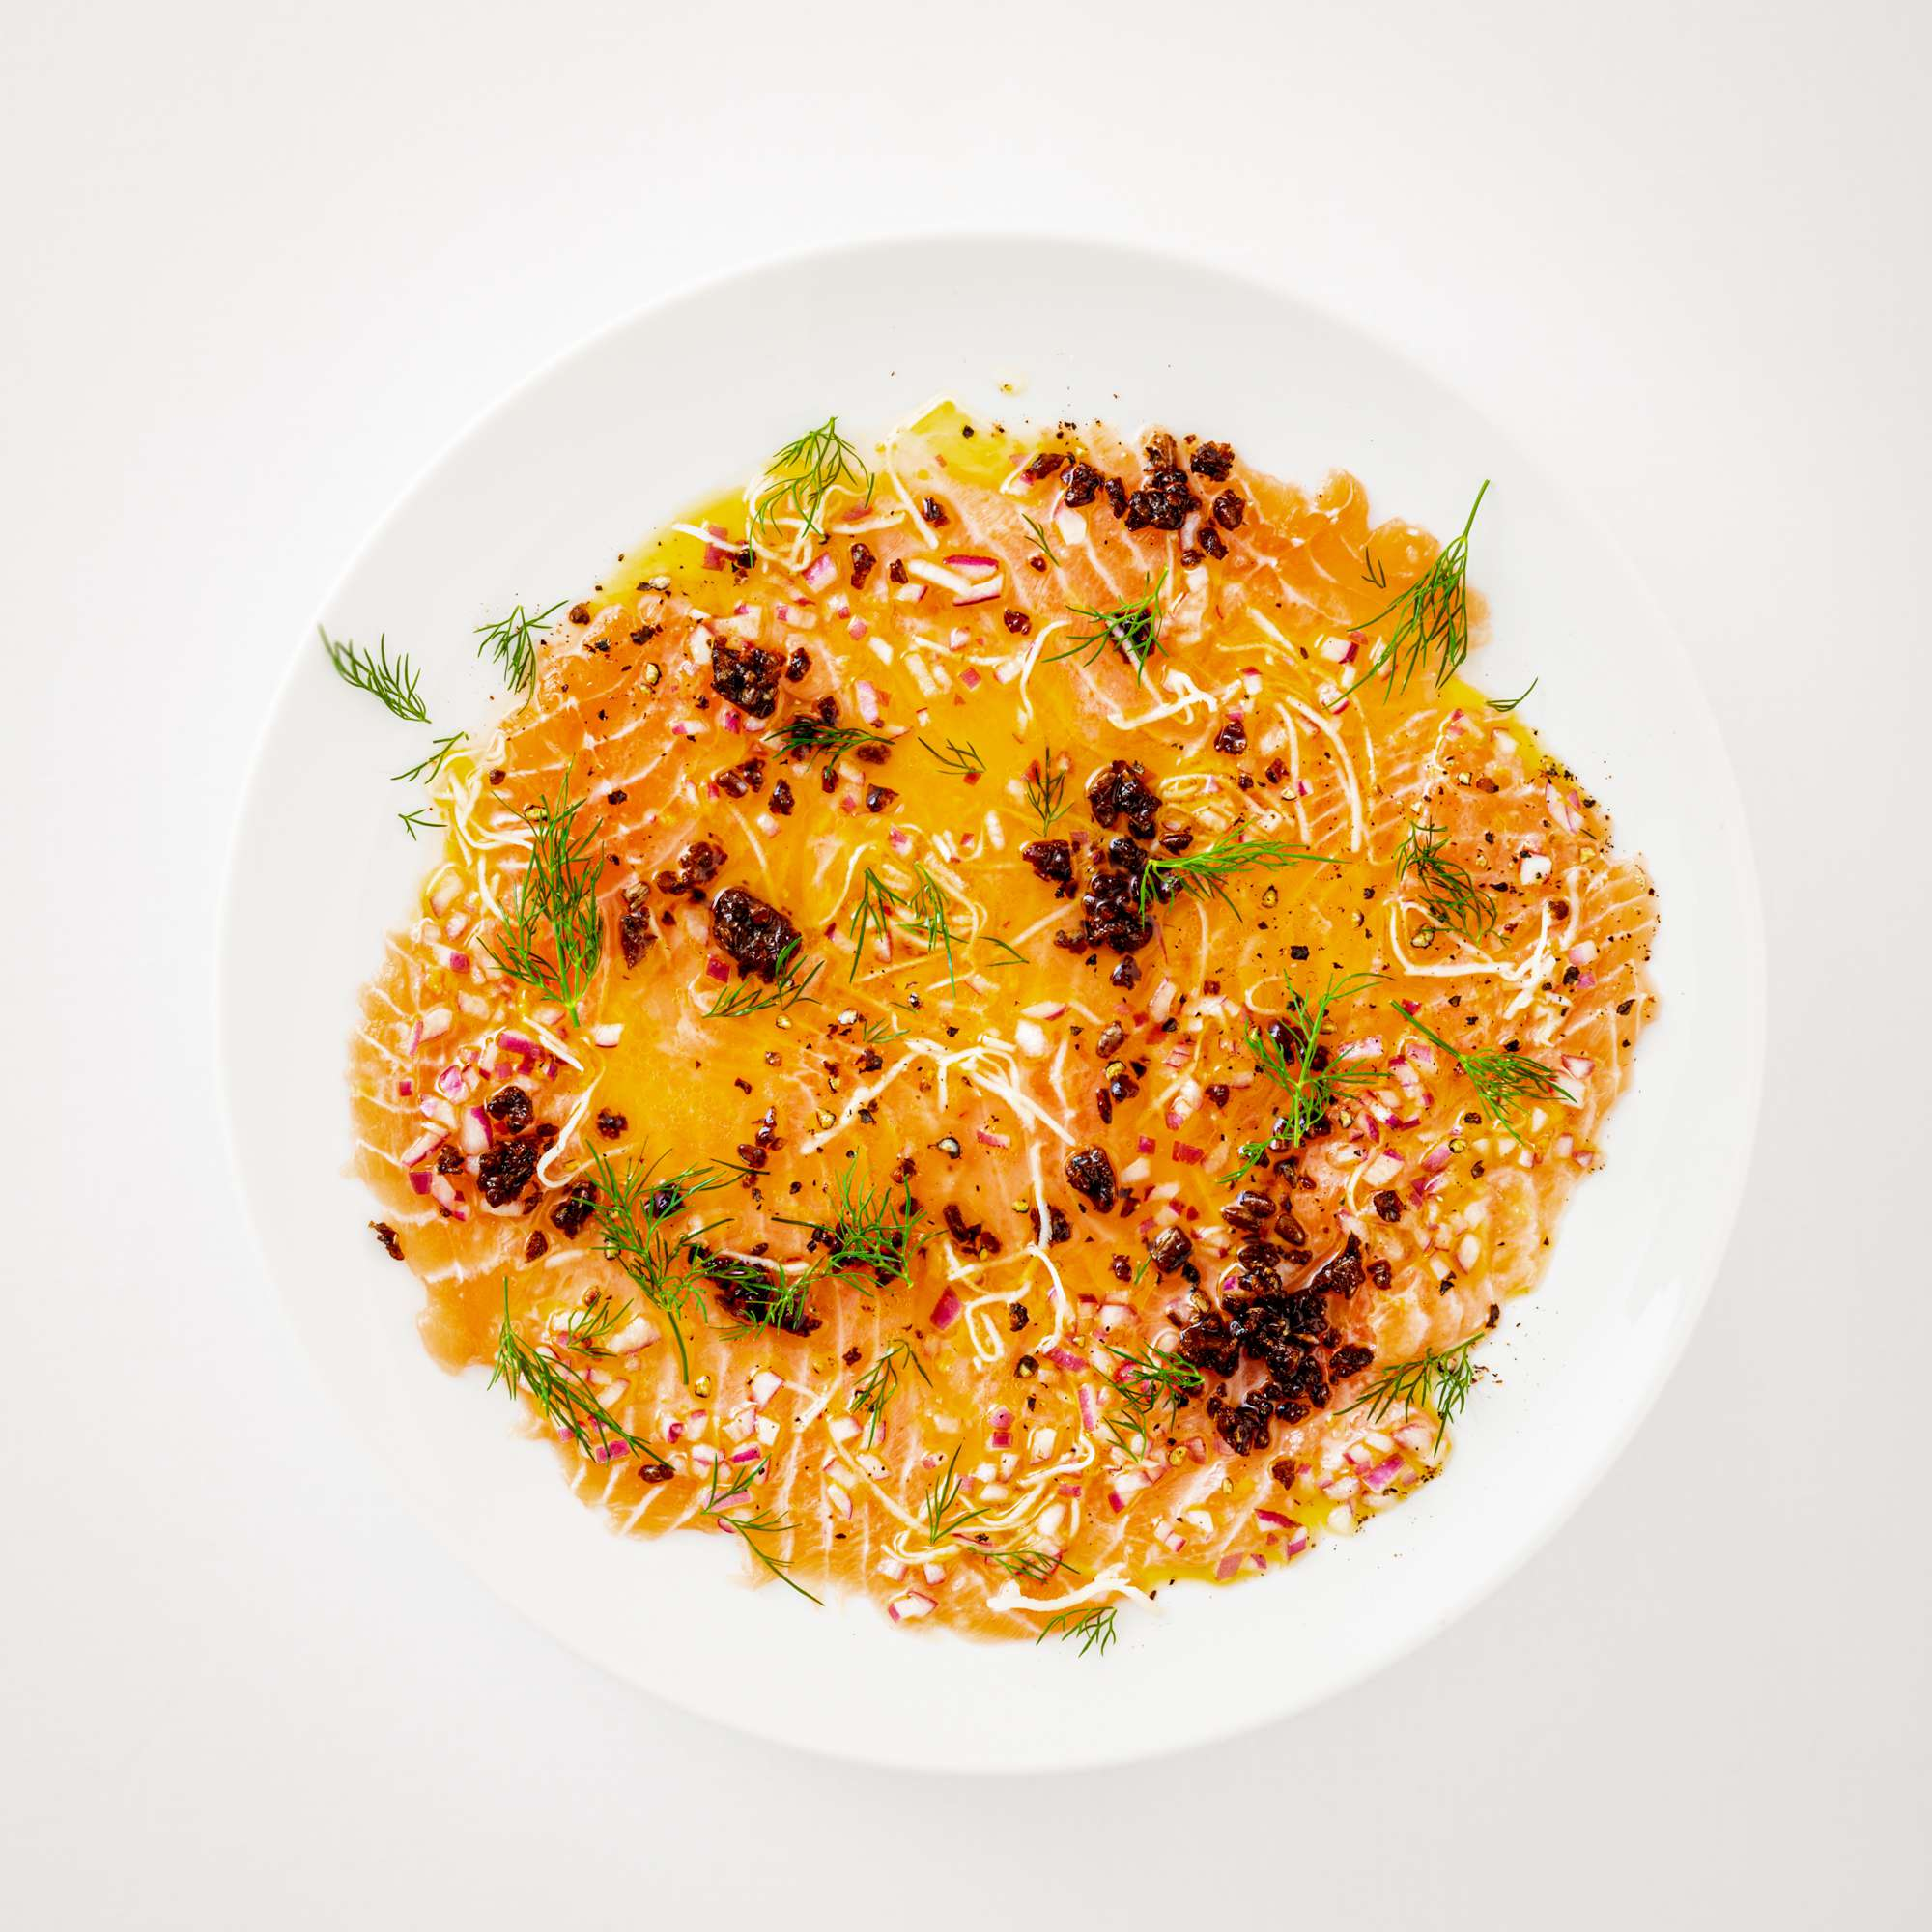 Nordisches Lachs-Ceviche